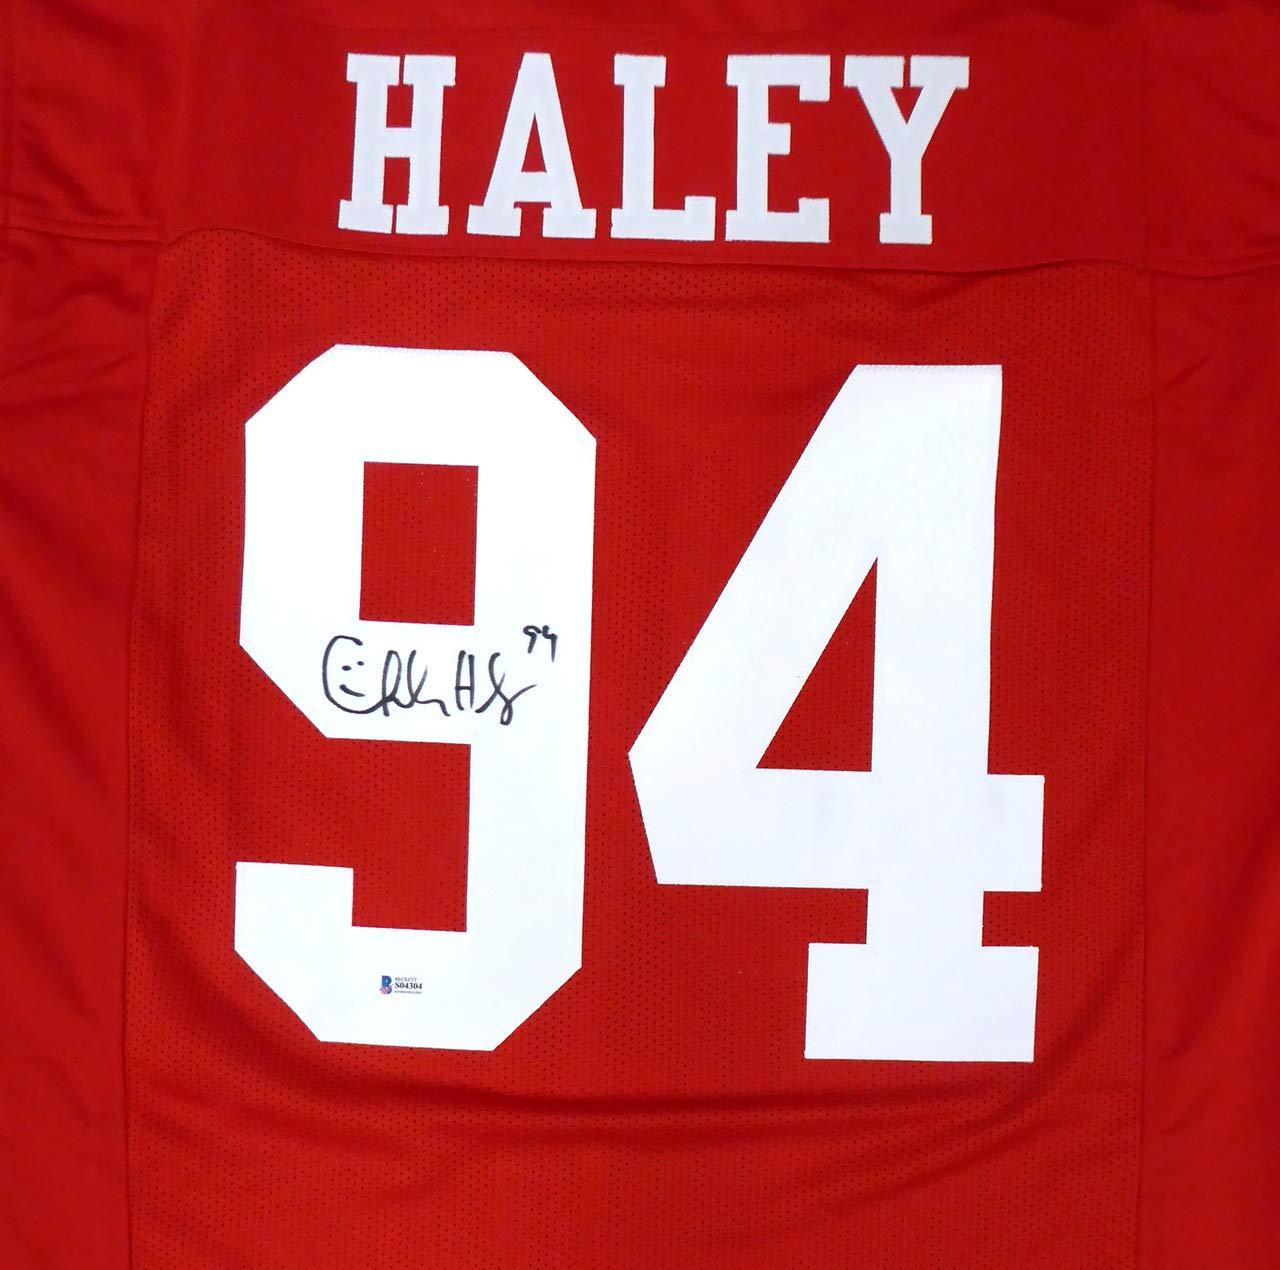 charles haley jersey